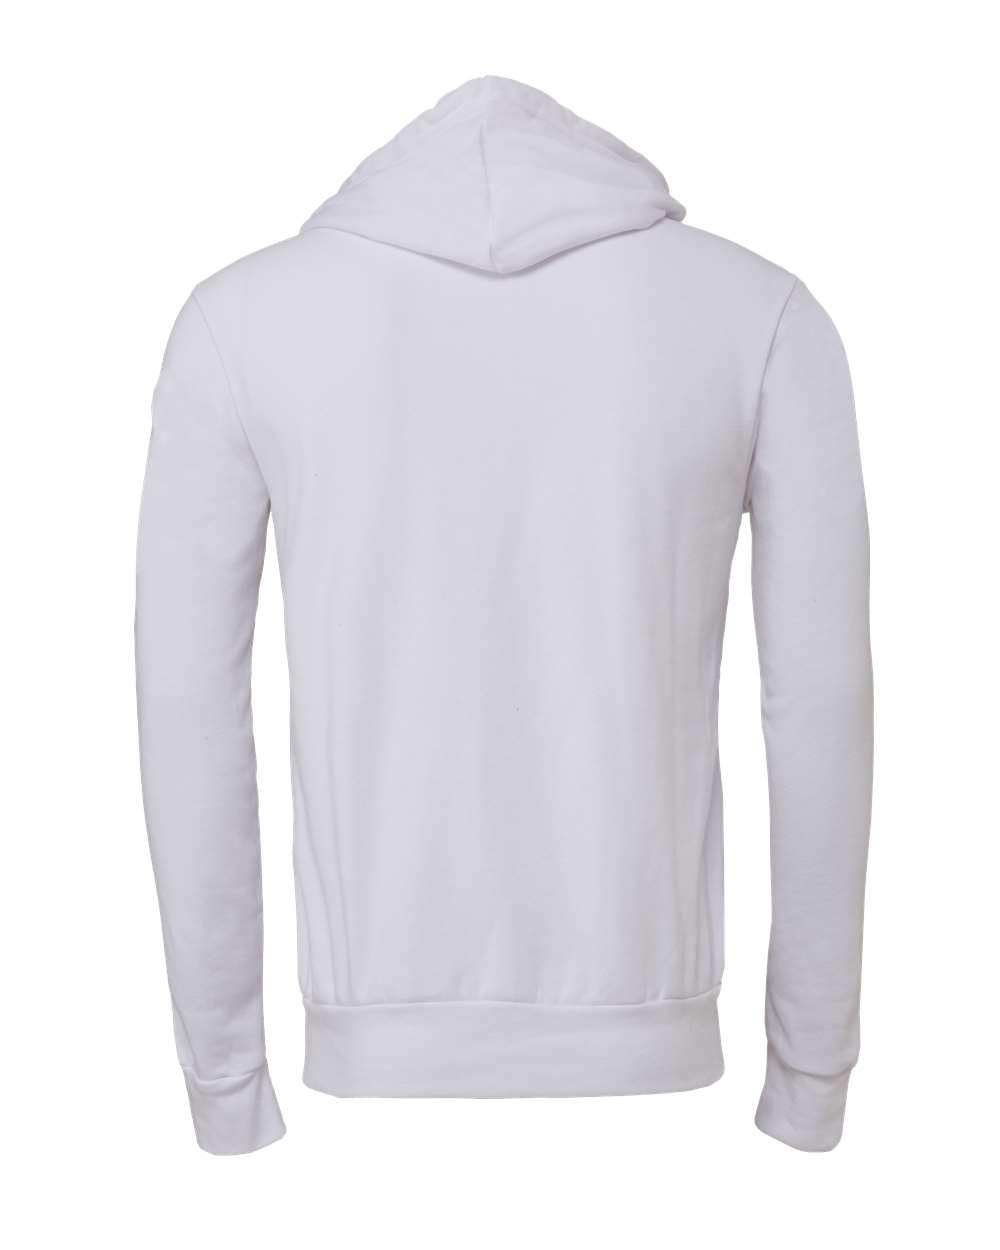 Bella-Canvas-Unisex-Sponge-Hooded-Pullover-Sweatshirt-Blank-3719-up-to-2XL thumbnail 104